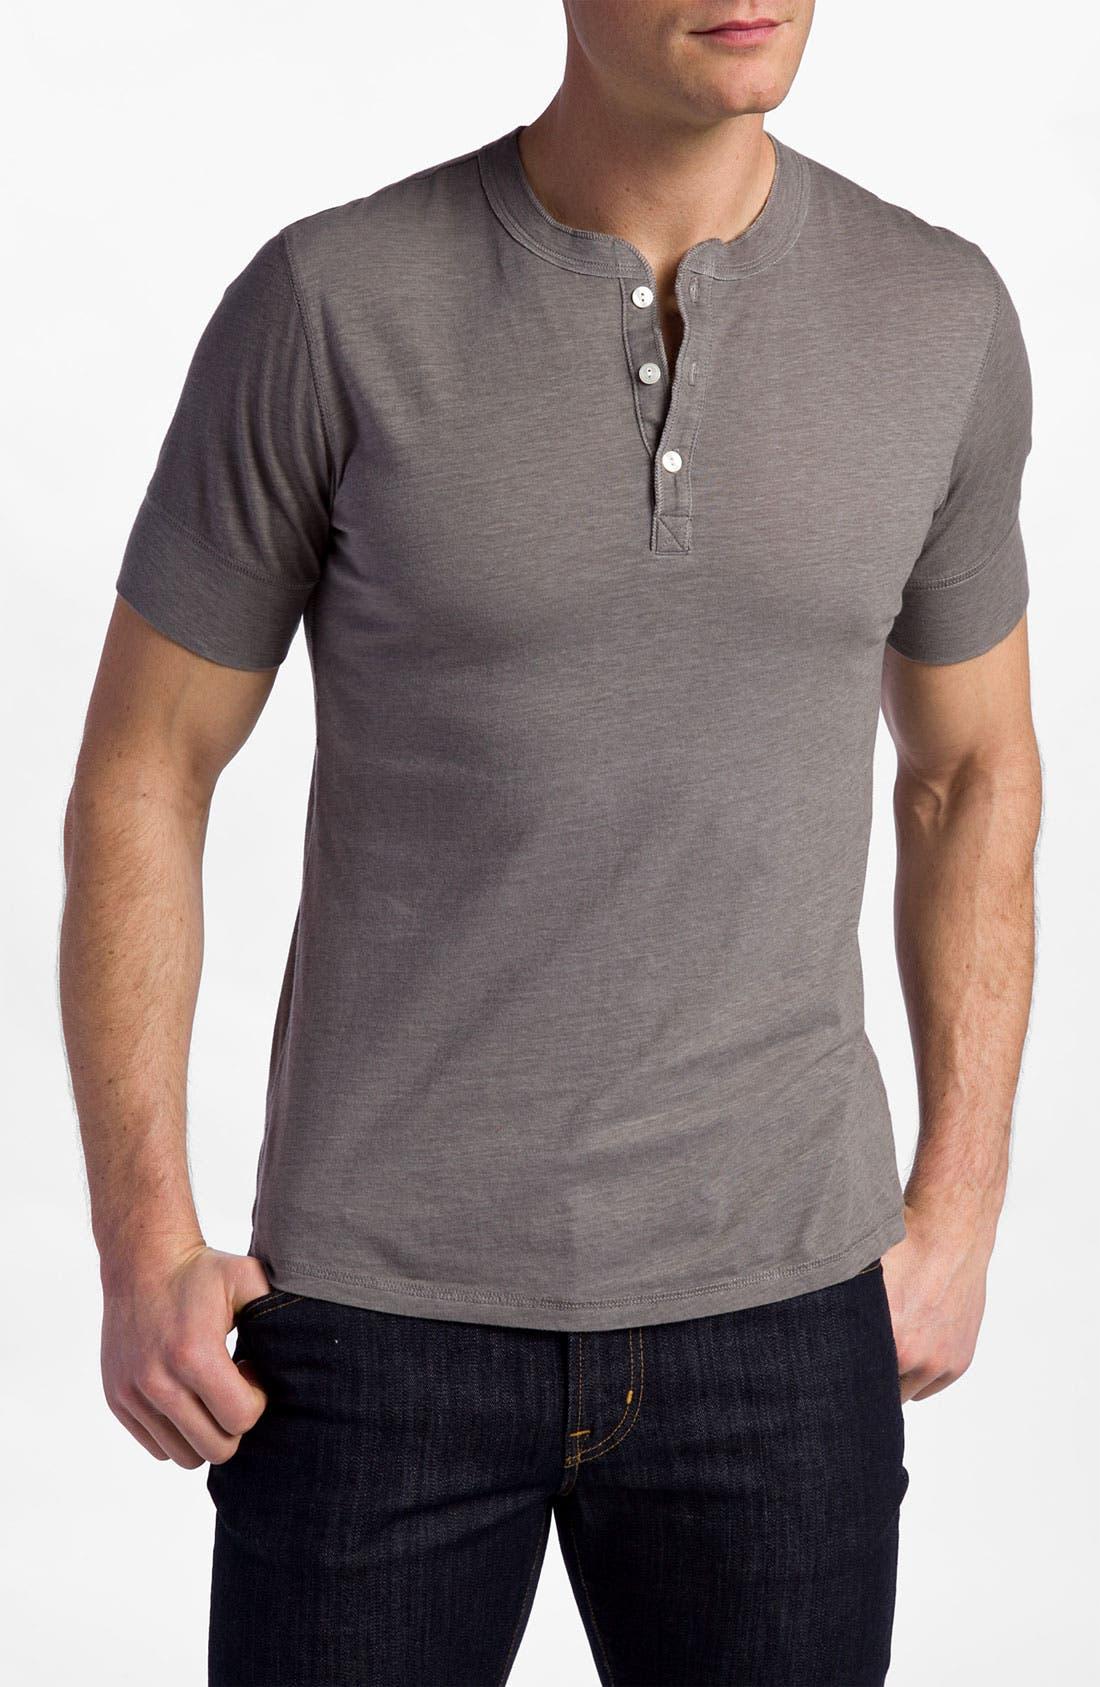 Main Image - NSF Clothing 'Archie' Short Sleeve Henley